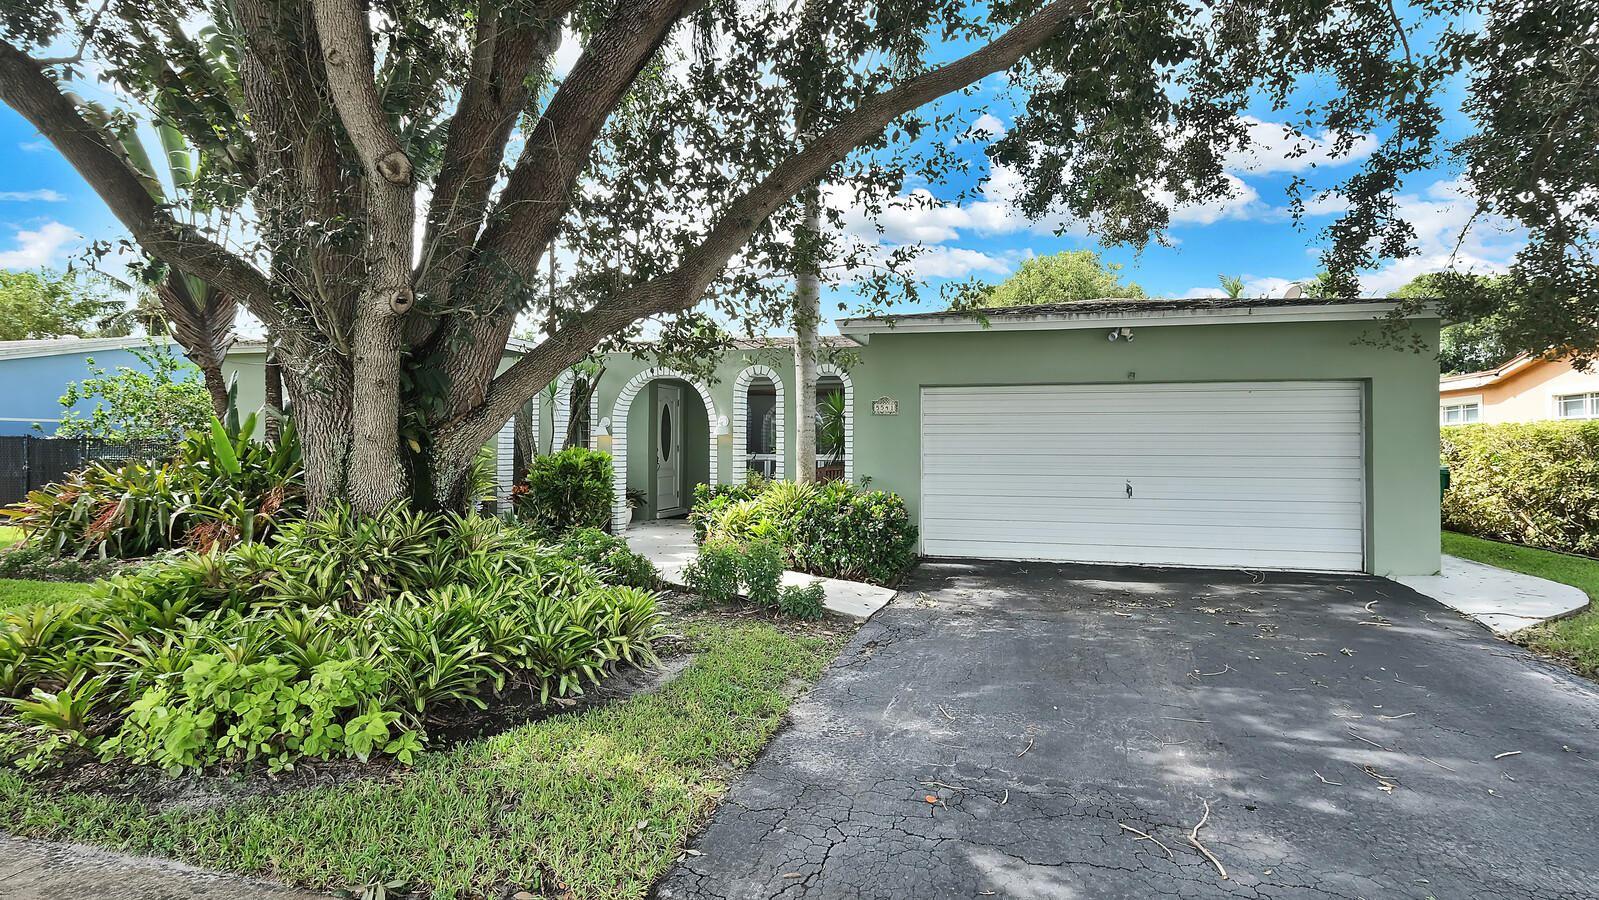 Photo of 5541 SW 94th Avenue, Cooper City, FL 33328 (MLS # RX-10665901)